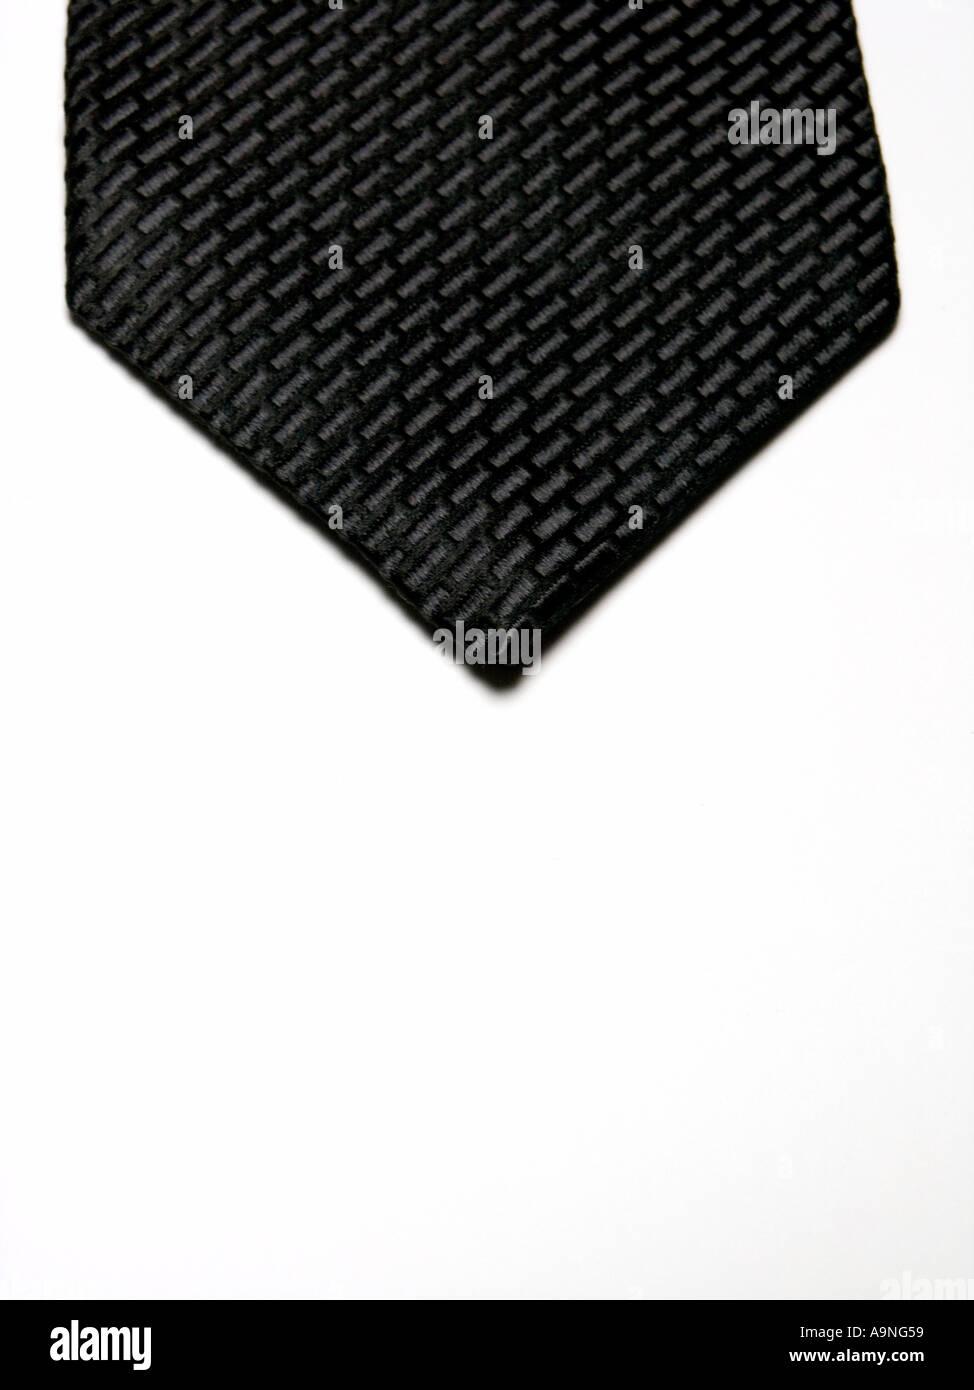 BLACK TIE ON WHITE BACKGROUND - Stock Image